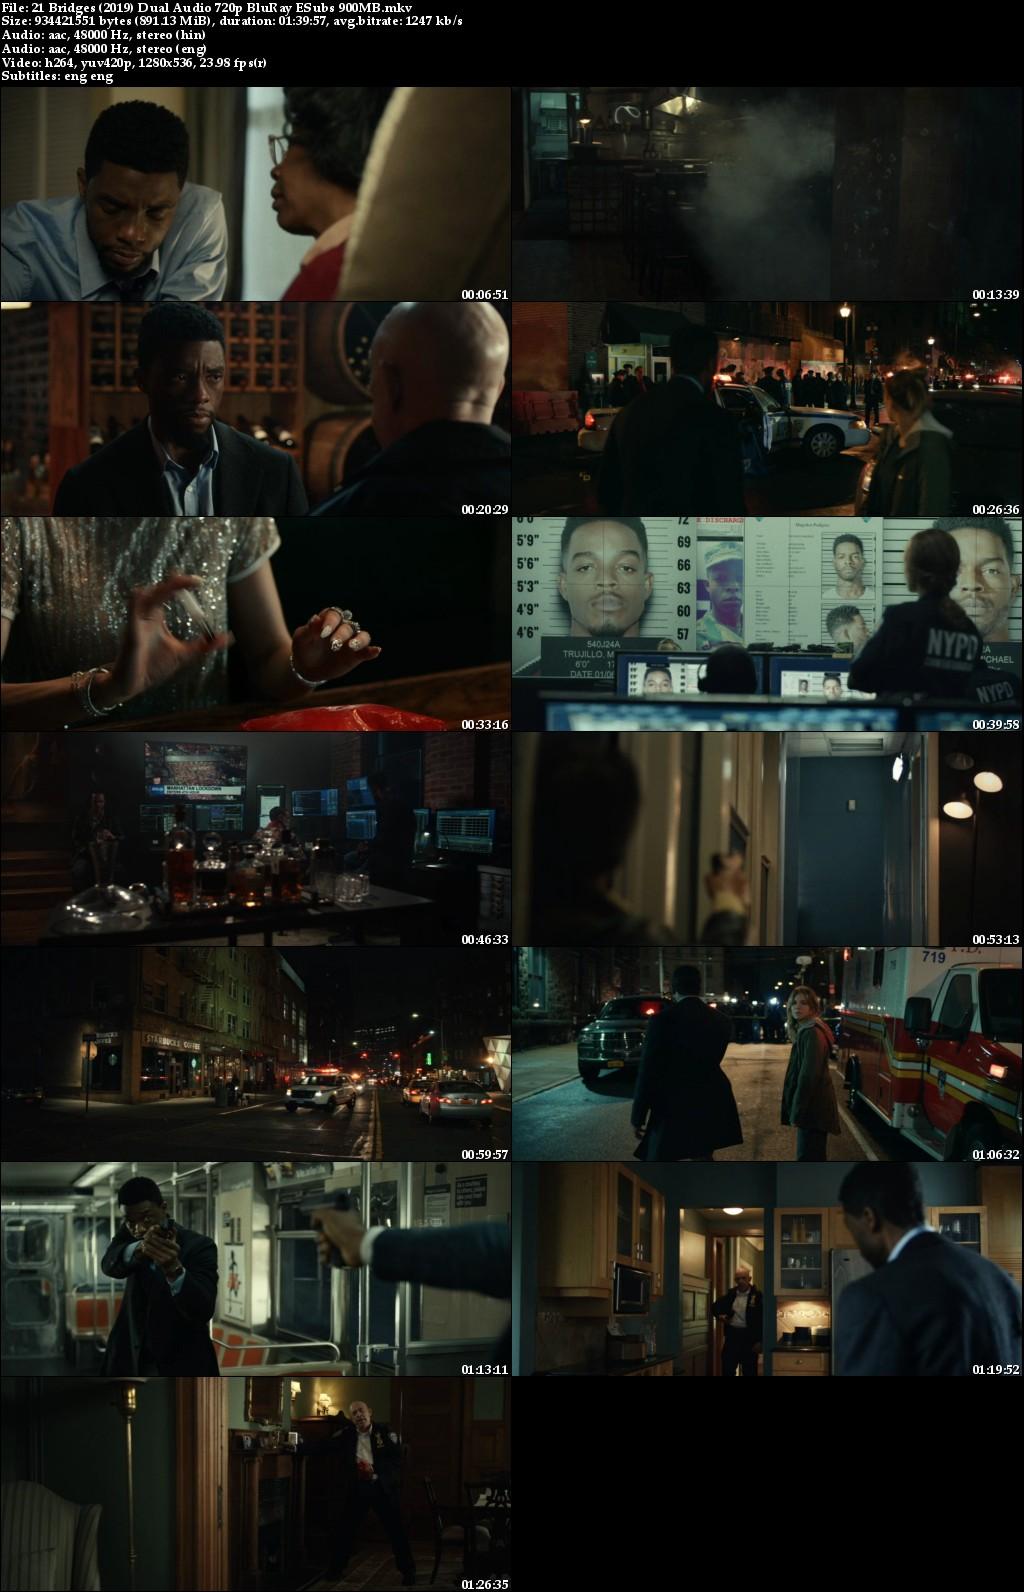 21-Bridges-2019-Dual-Audio-720p-Blu-Ray-ESubs-900-MB